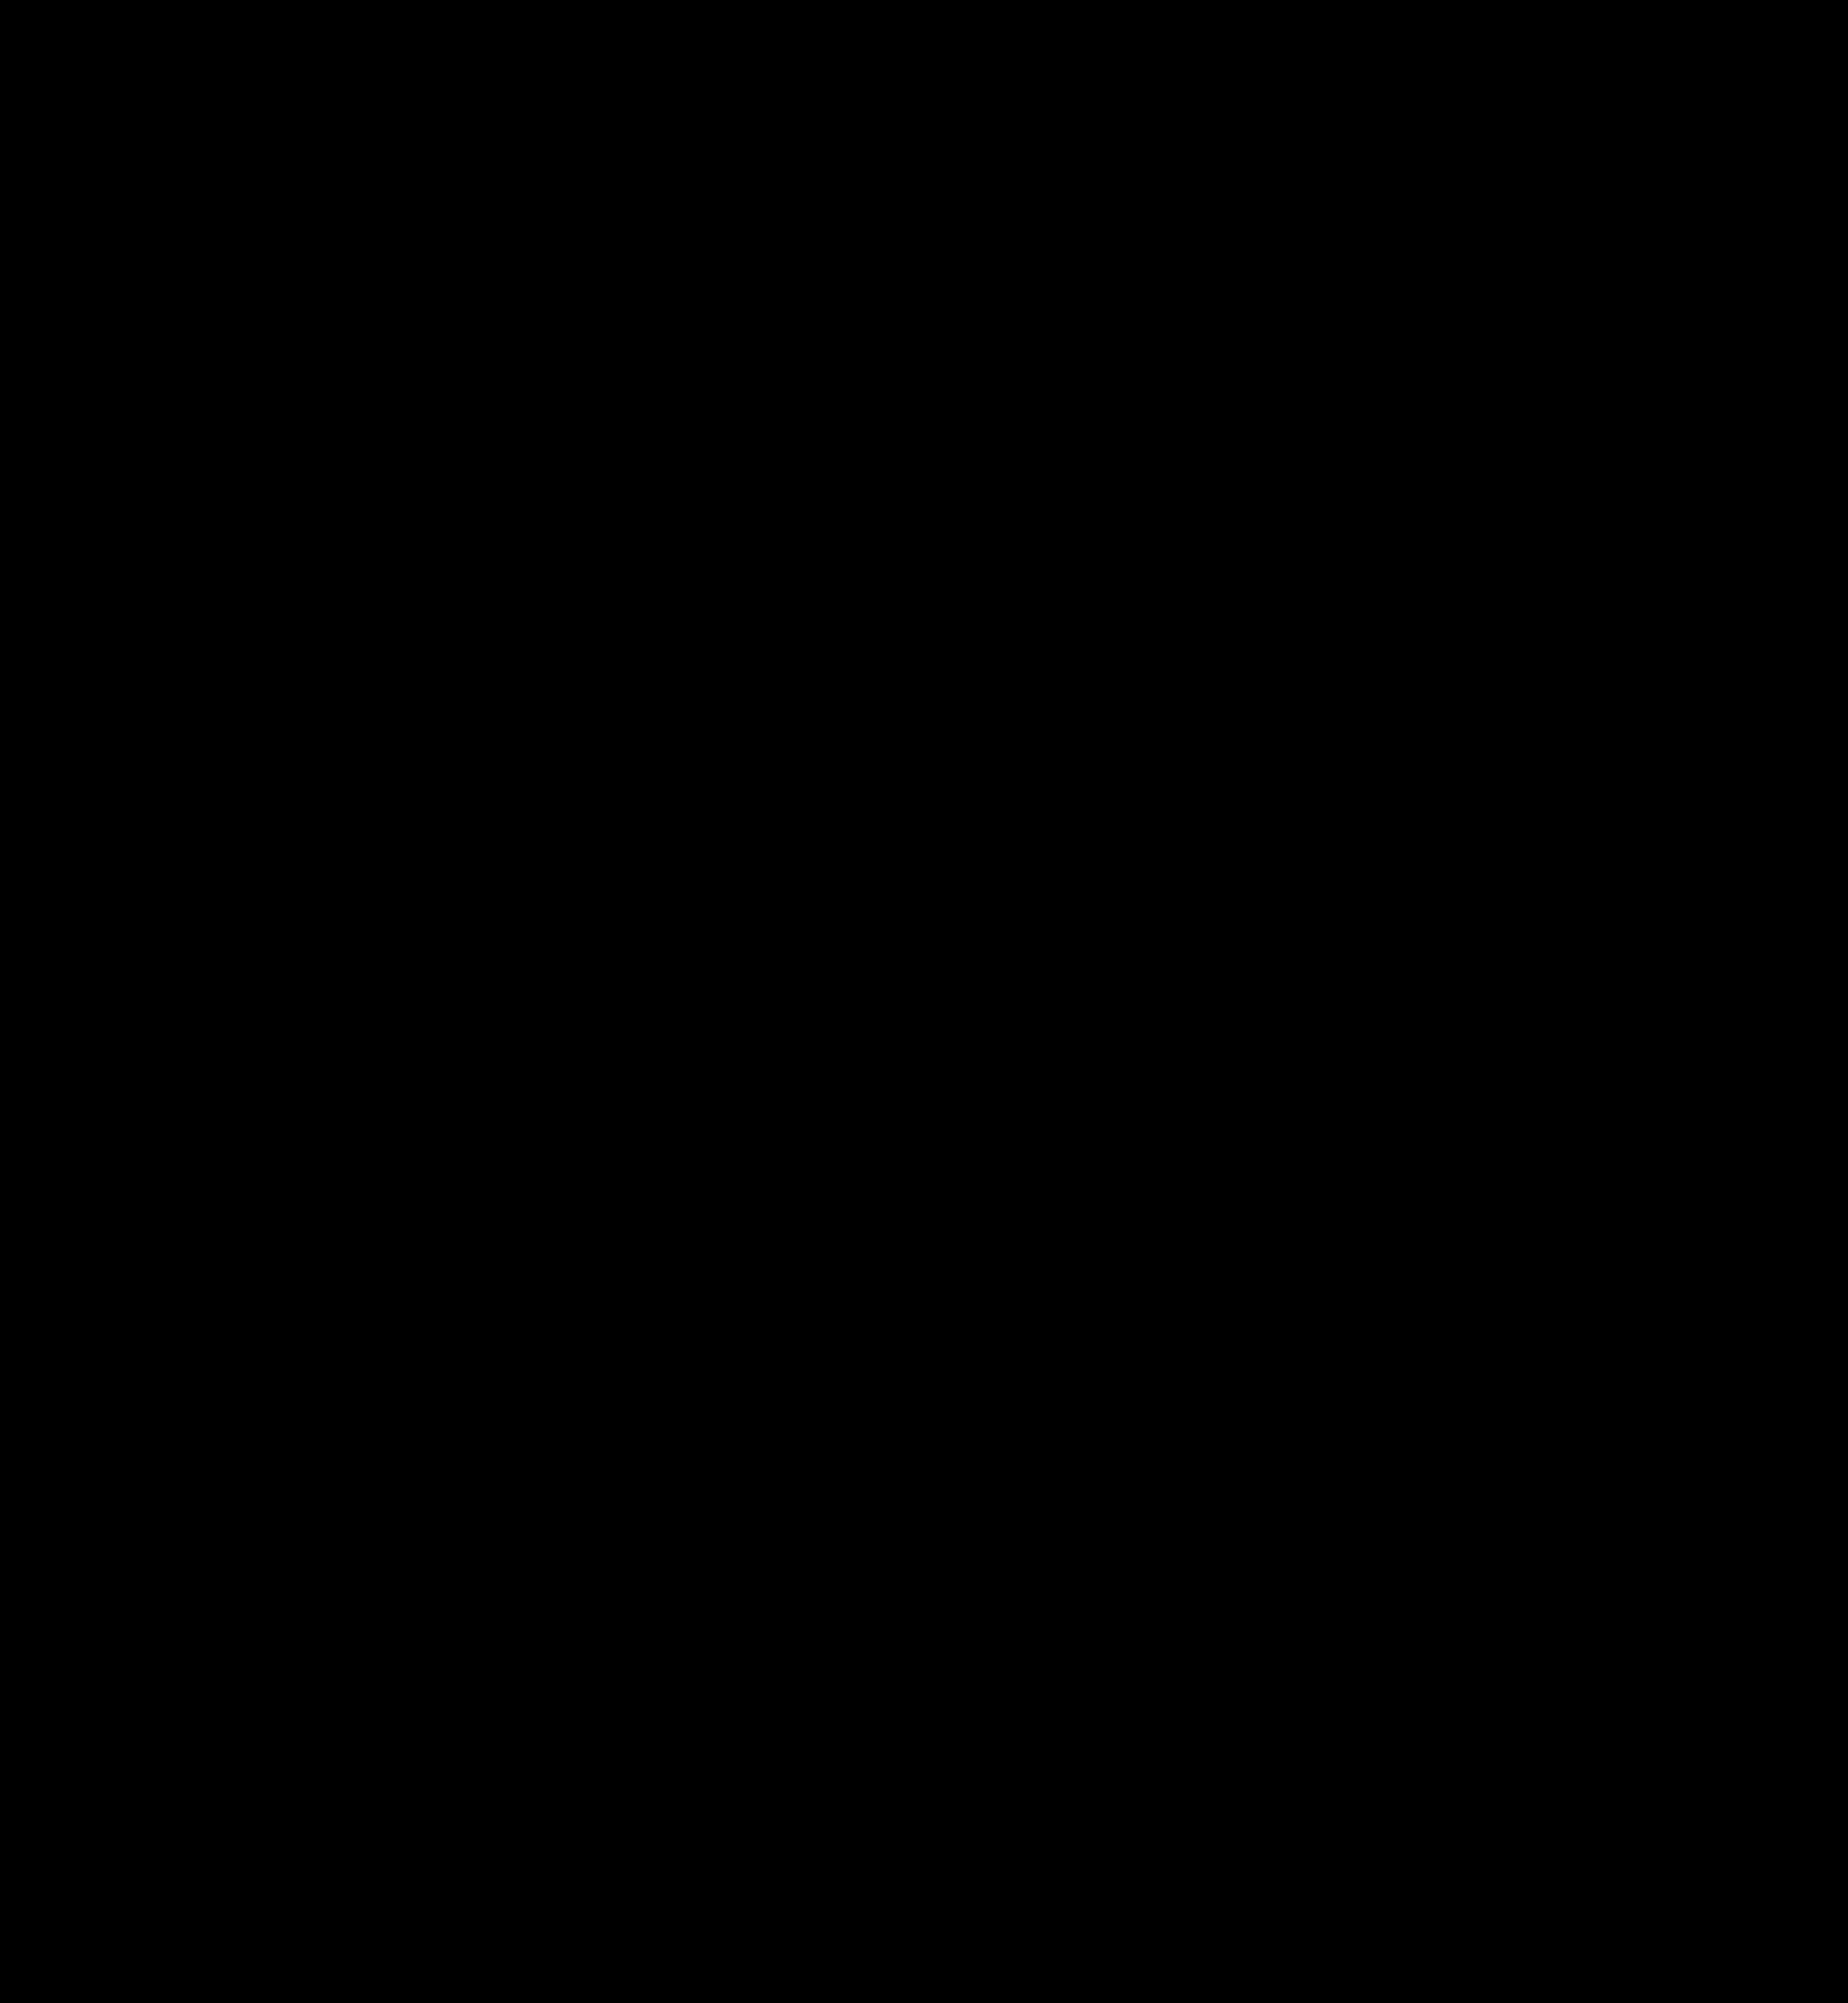 2214x2400 Clipart